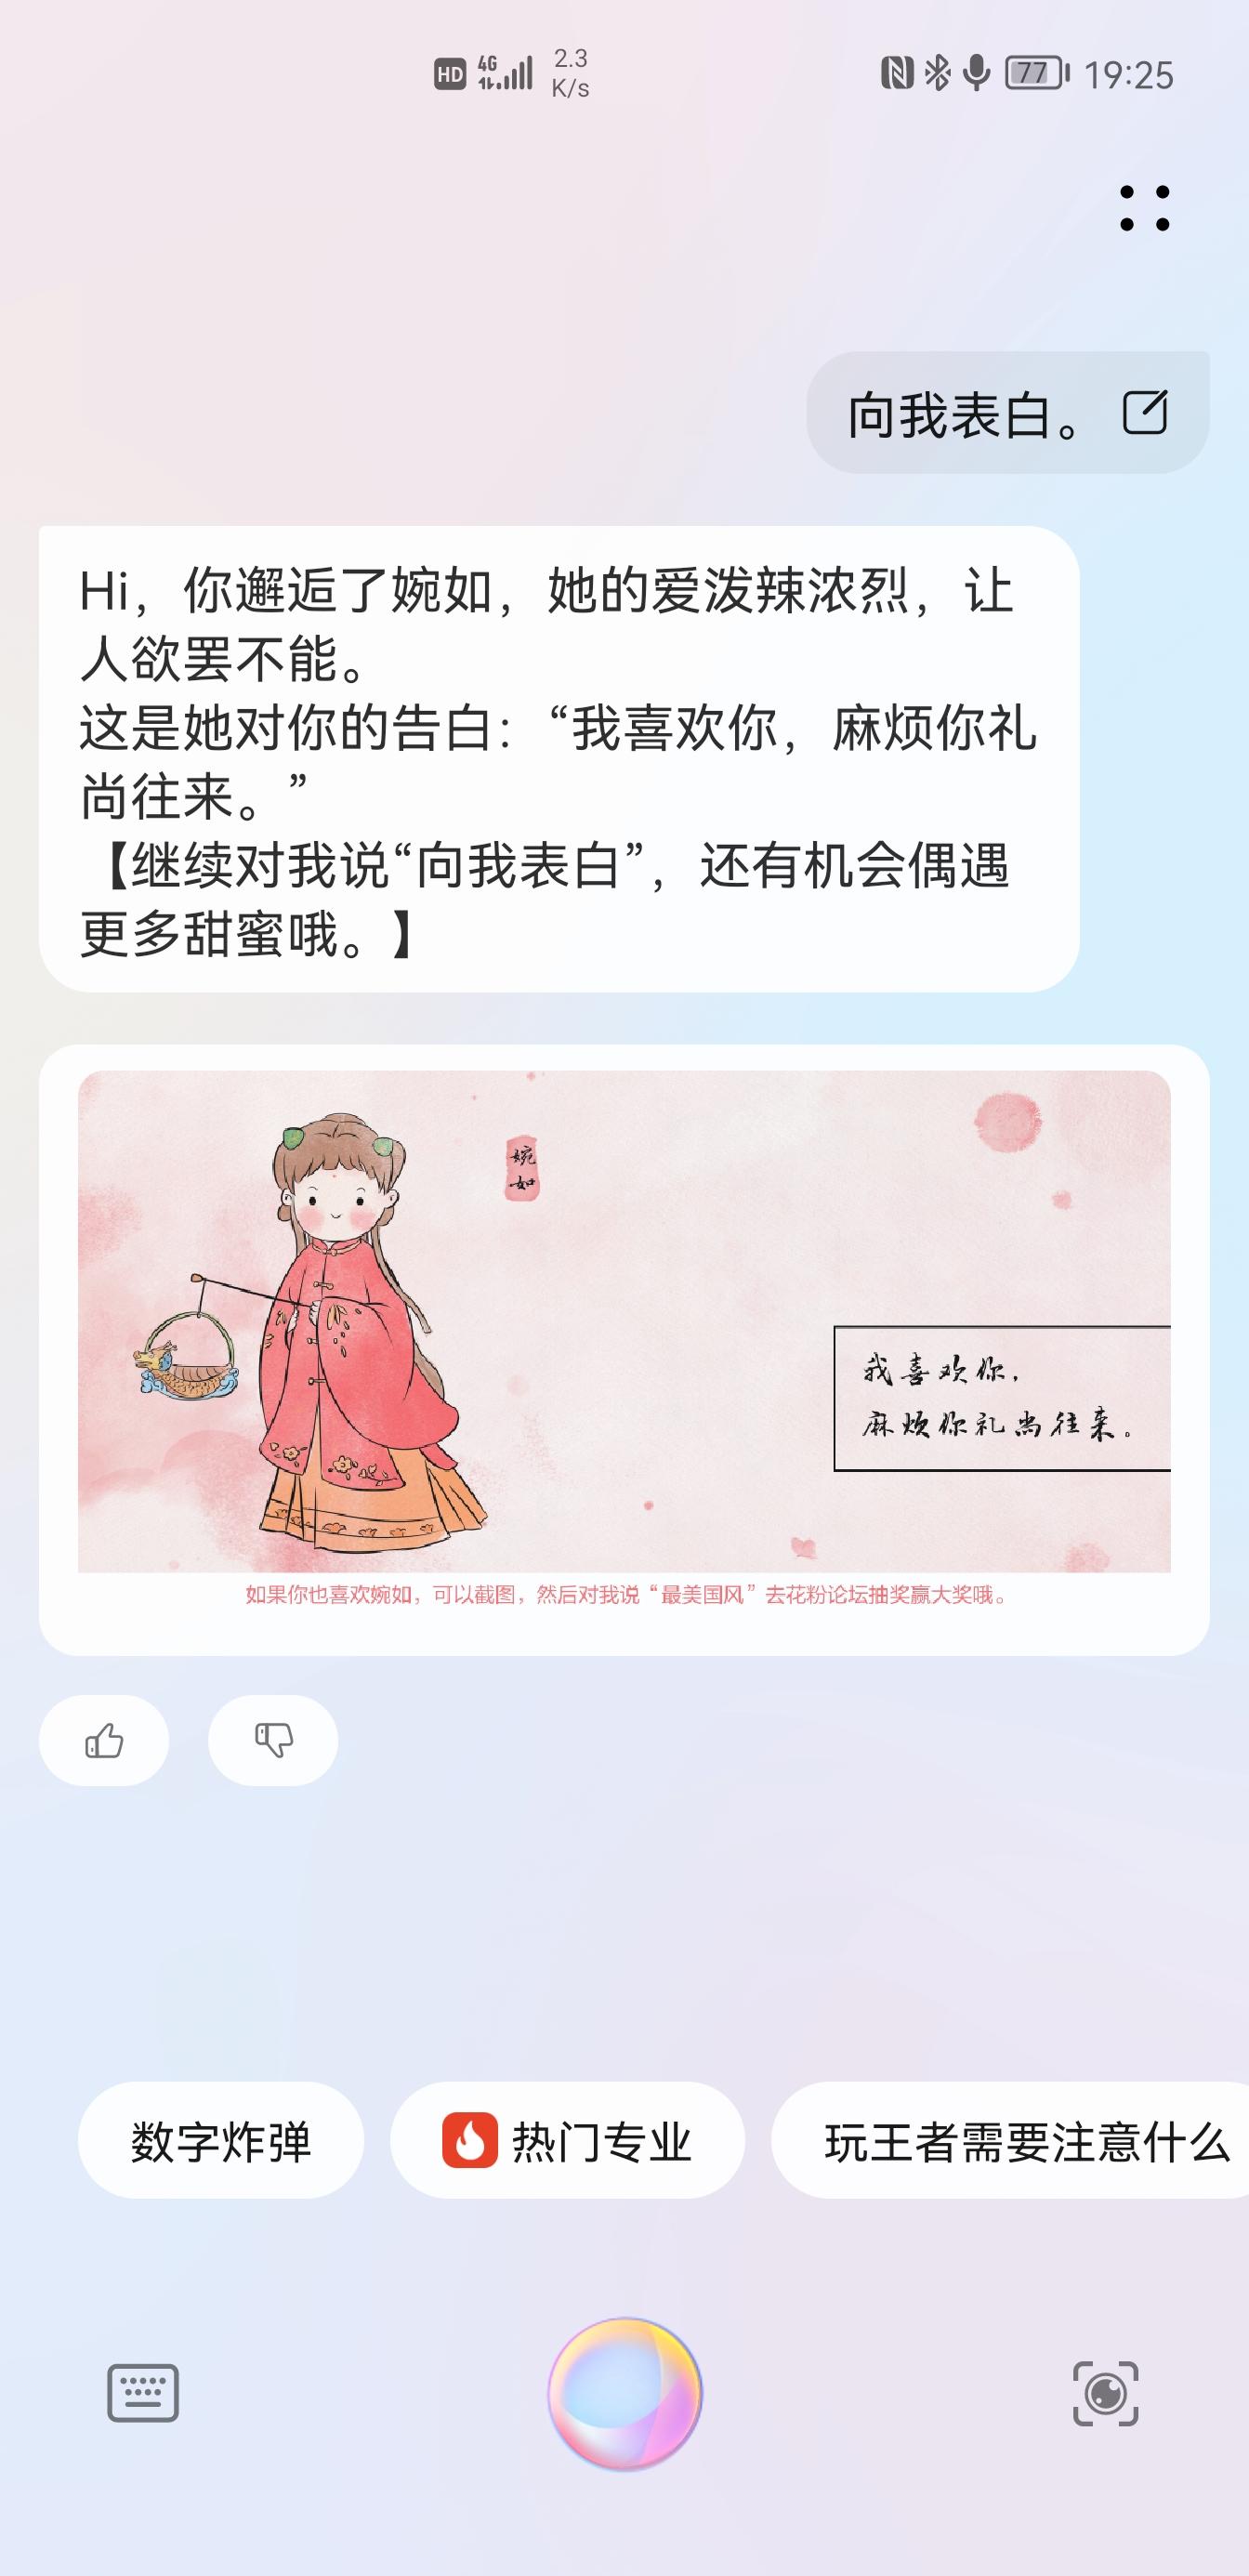 Screenshot_20210611_192512_com.huawei.vassistant.jpg